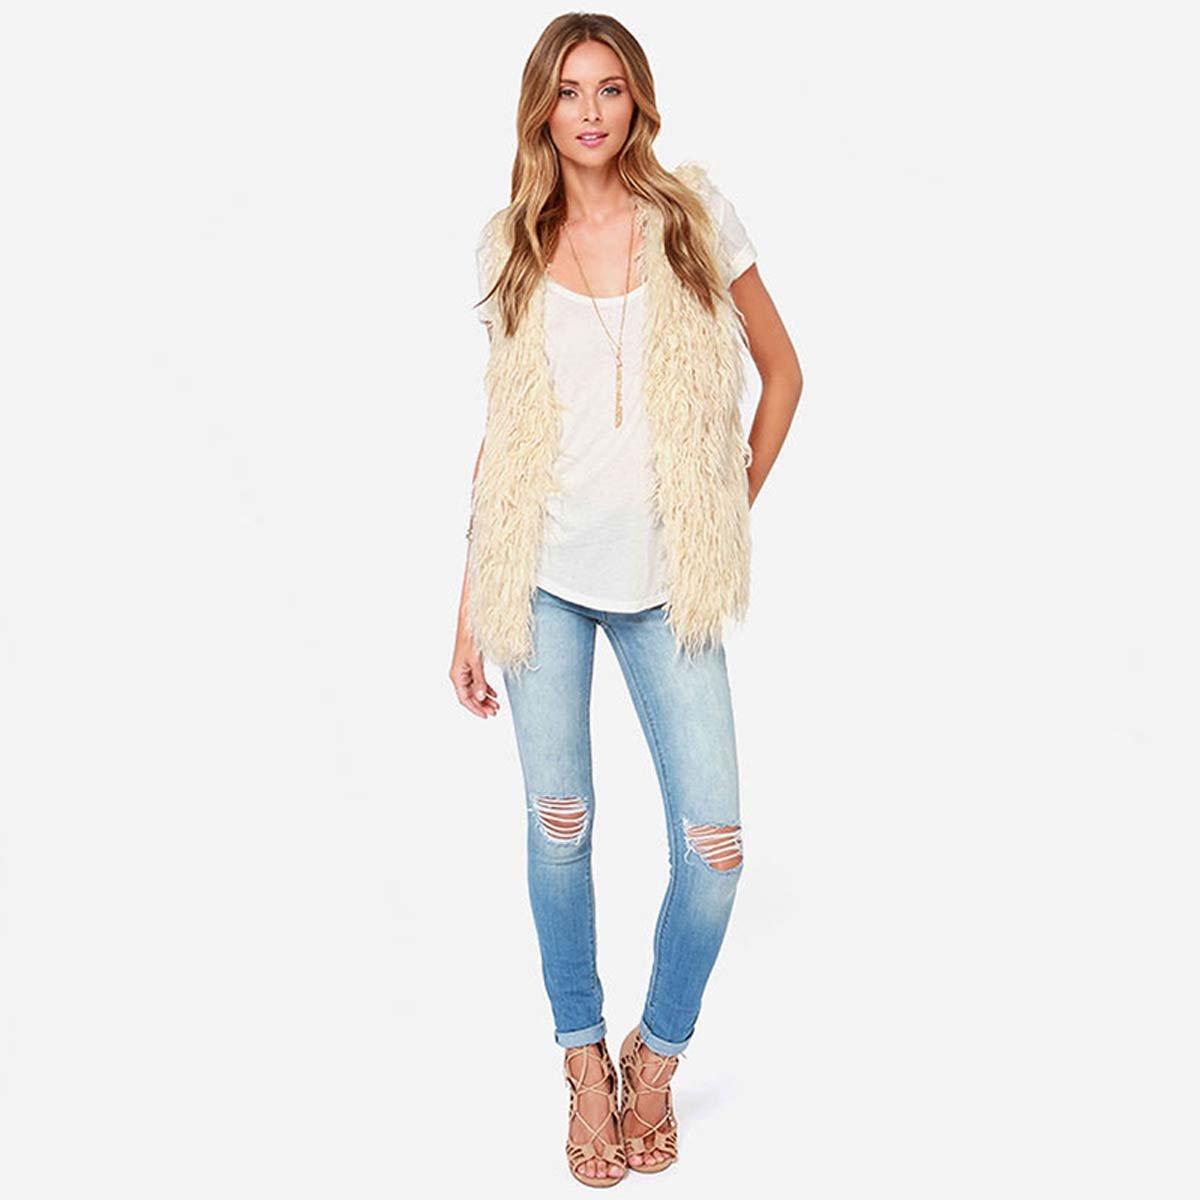 Amazon.com: WeHeart Women Beige Faux Fur Collarless Hairy Winter Vest:  Clothing